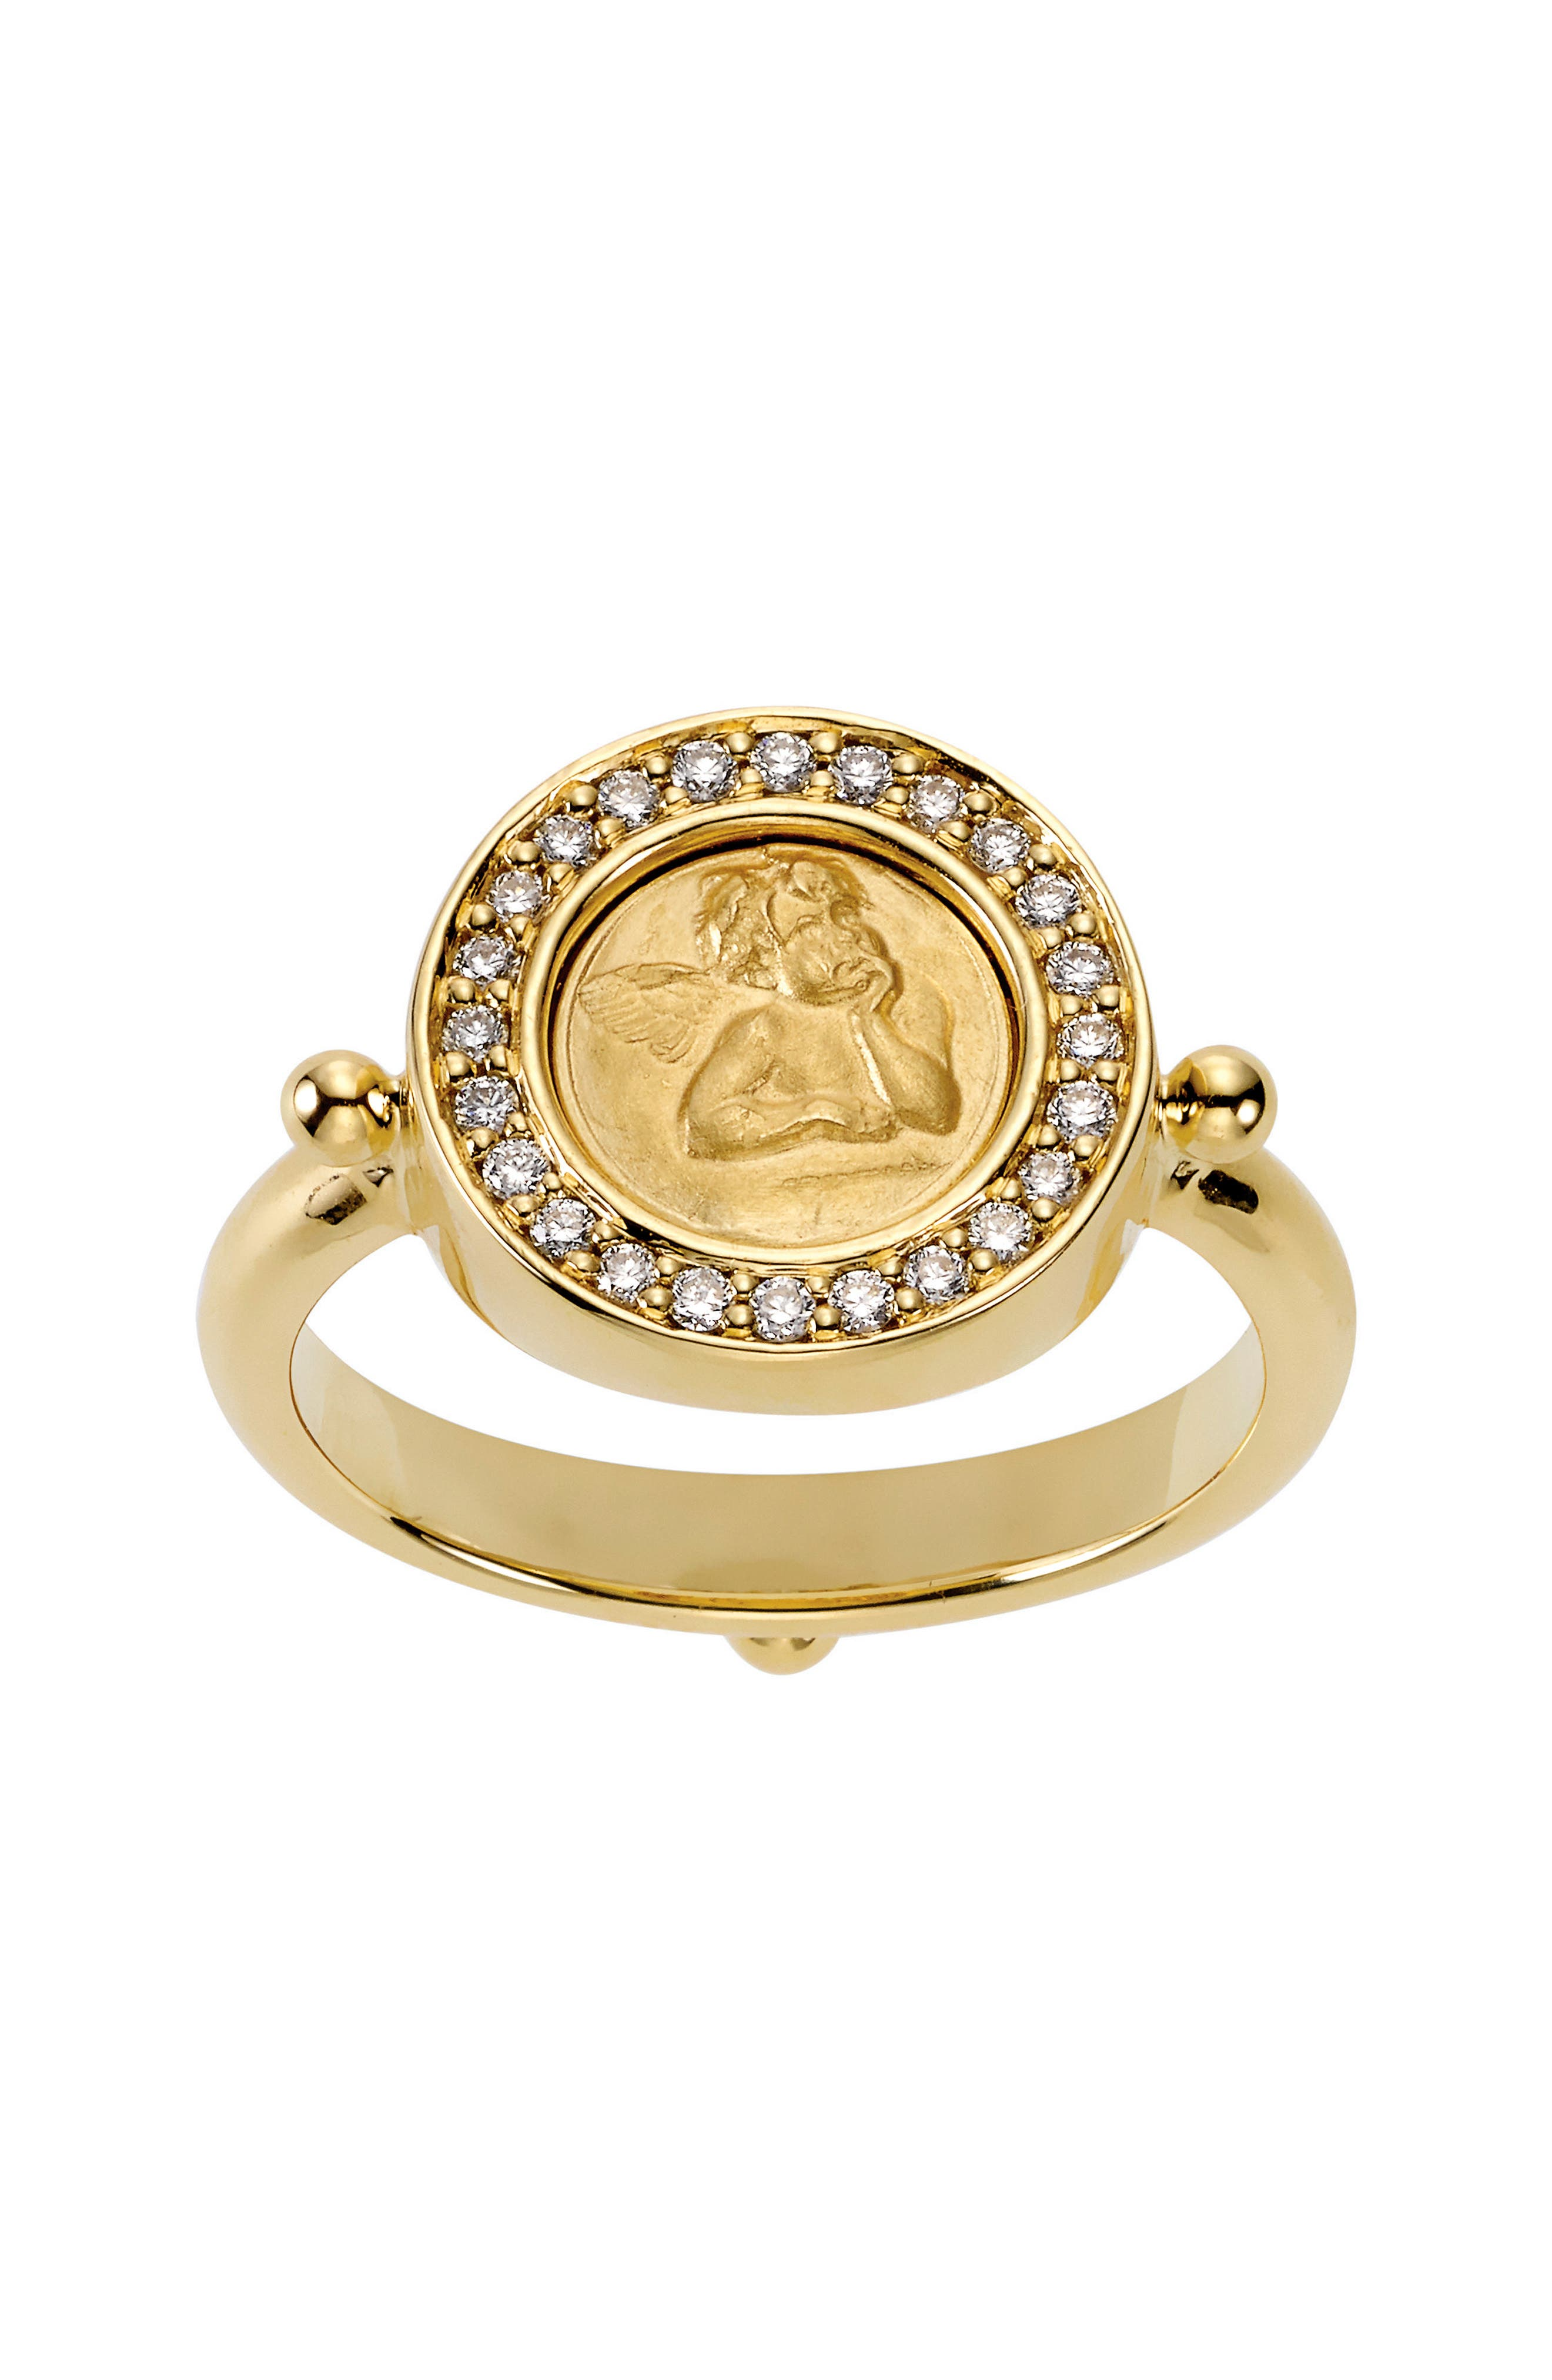 Temple St. Clair Diamond Pavé Ring,                             Main thumbnail 1, color,                             YELLOW GOLD